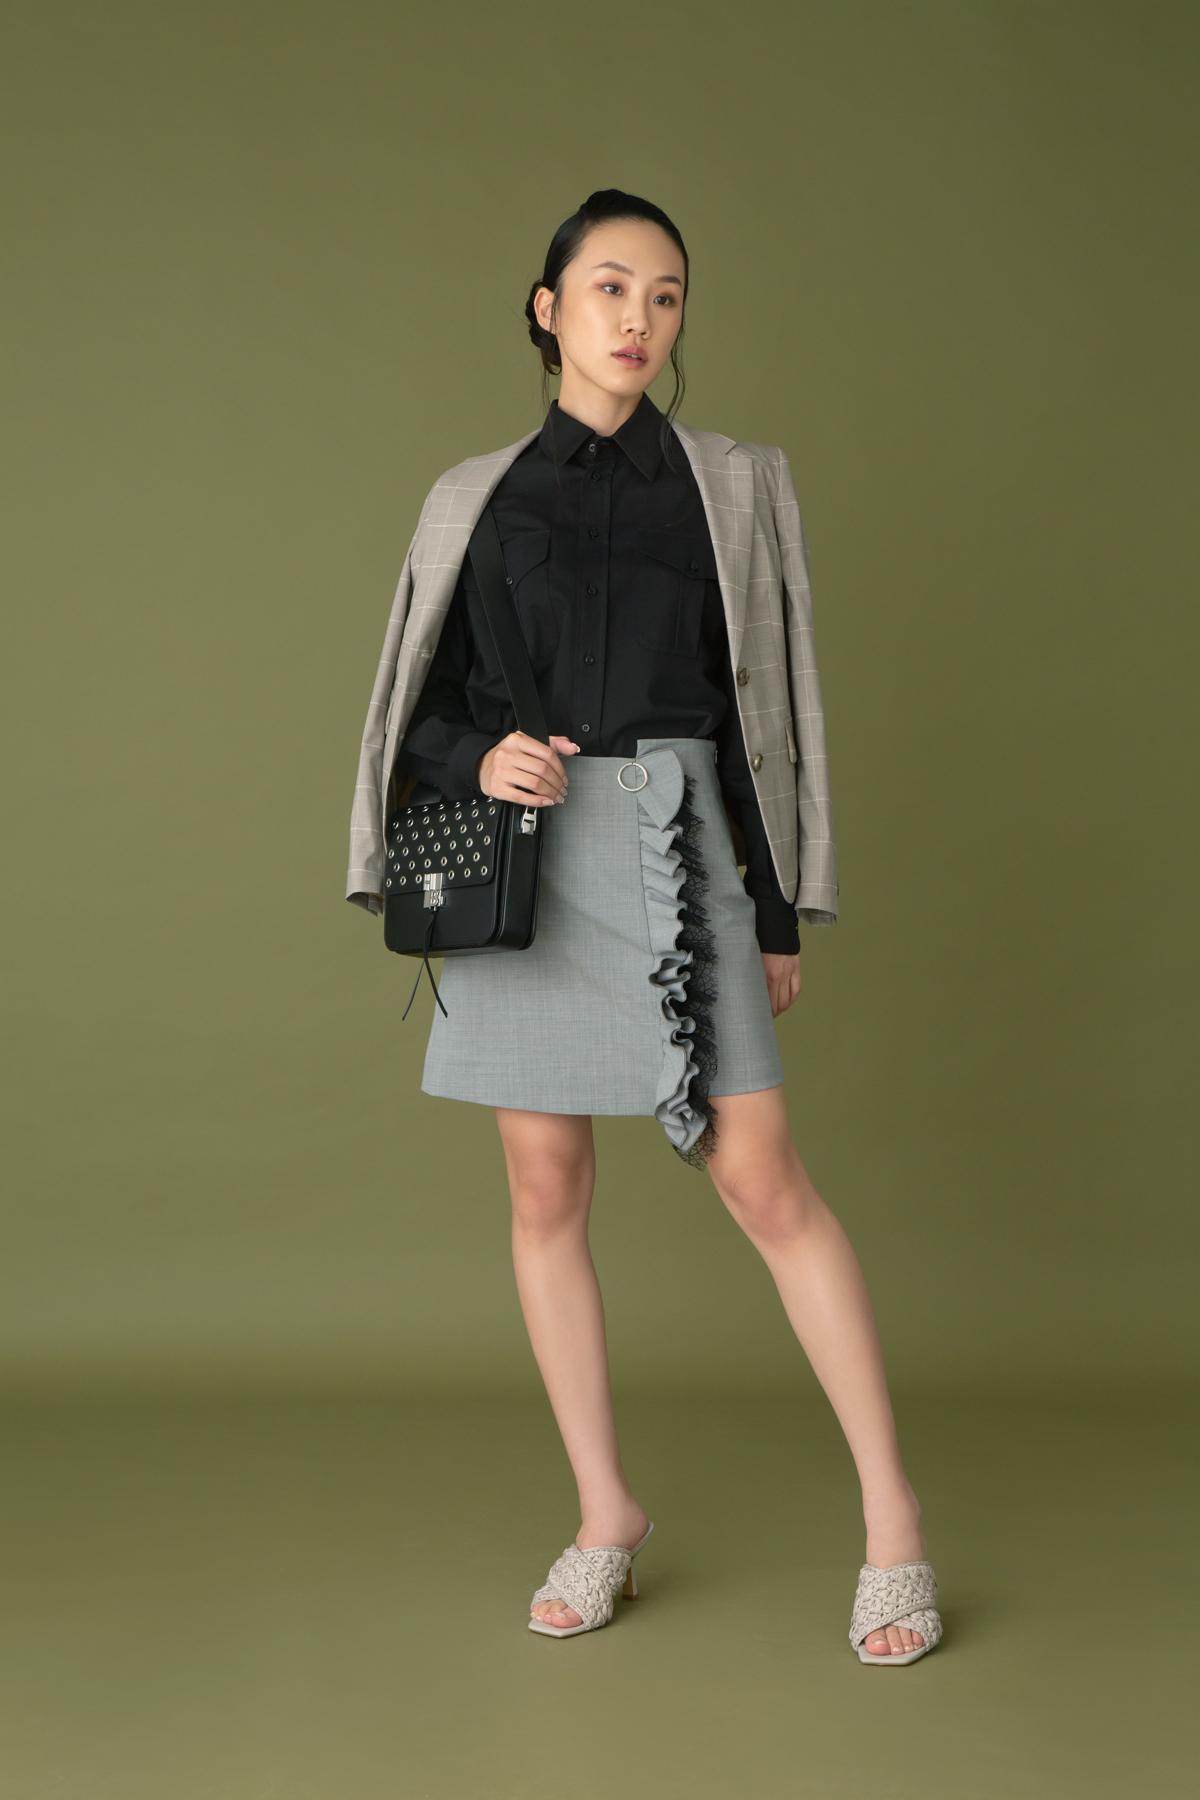 Ralph Lauren black cotton shirt $5,800 Hugo Boss checked blazer $4,500 Act N1 x Marella checked ruffles skirt $1,980 Hugo Boss leather handbag with studs $7,300 H&M beige sandals $349